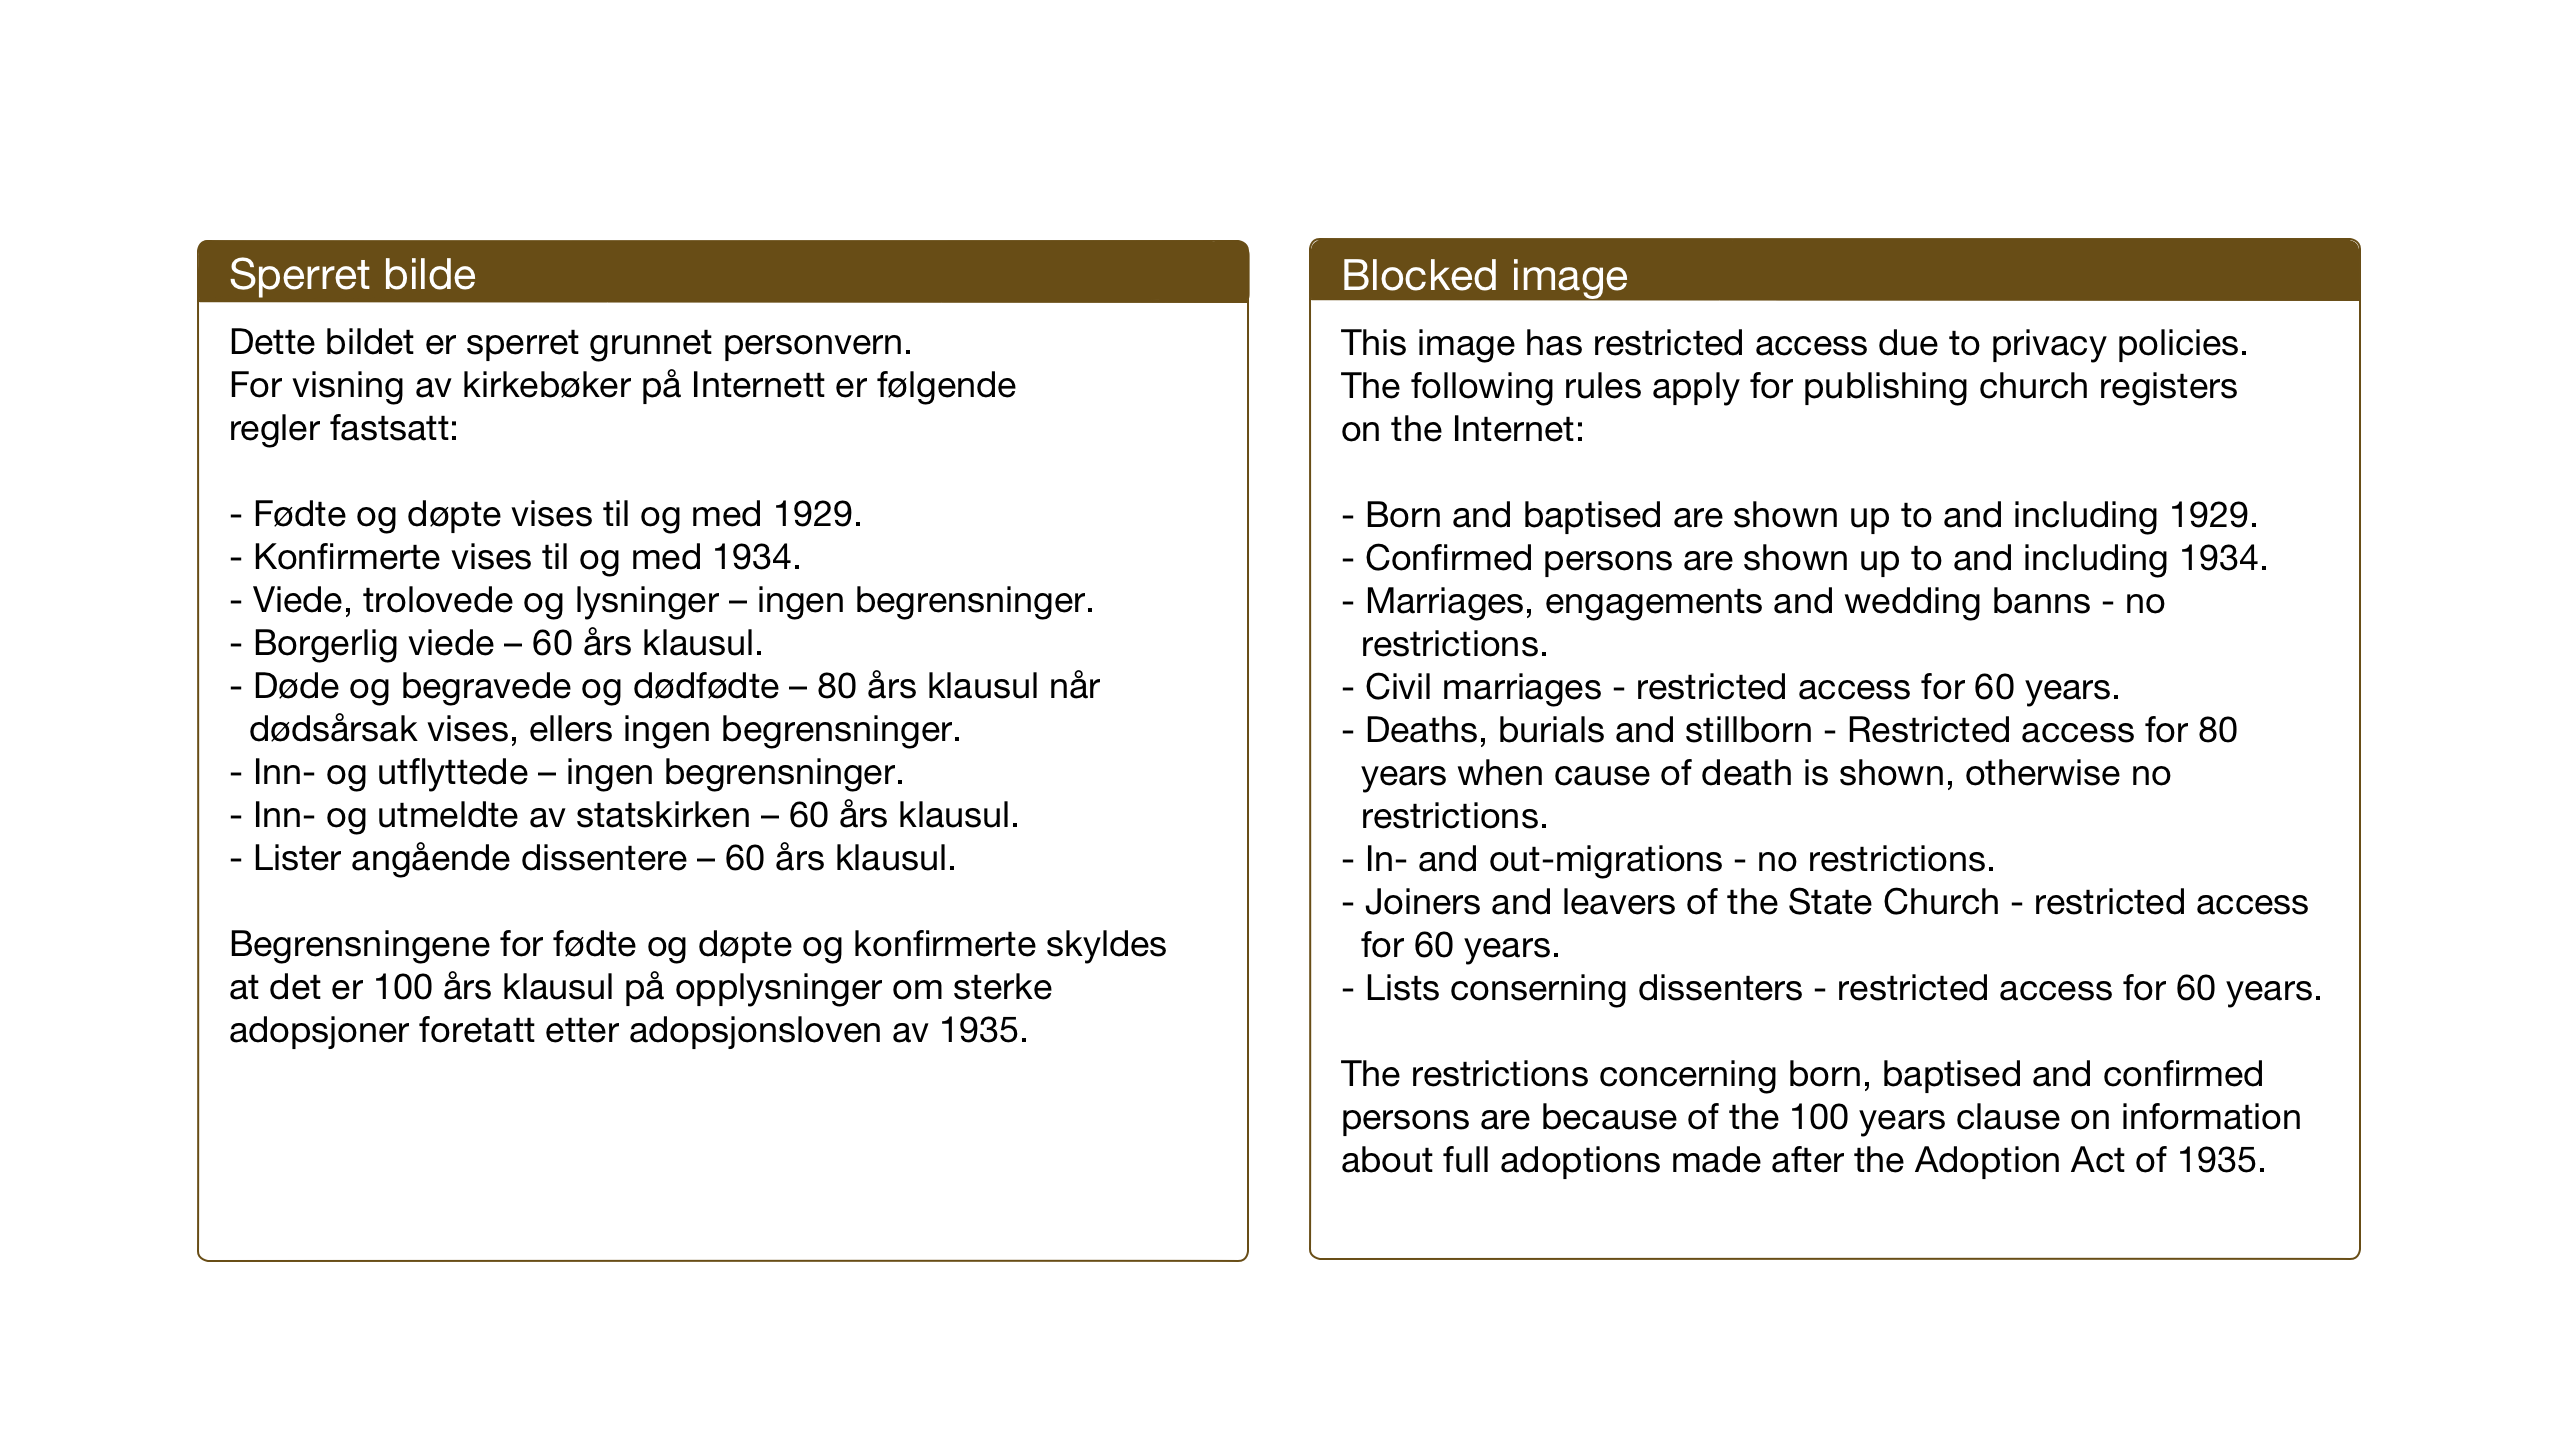 SAH, Vardal prestekontor, H/Ha/Haa/L0018: Ministerialbok nr. 18, 1930-1945, s. 40